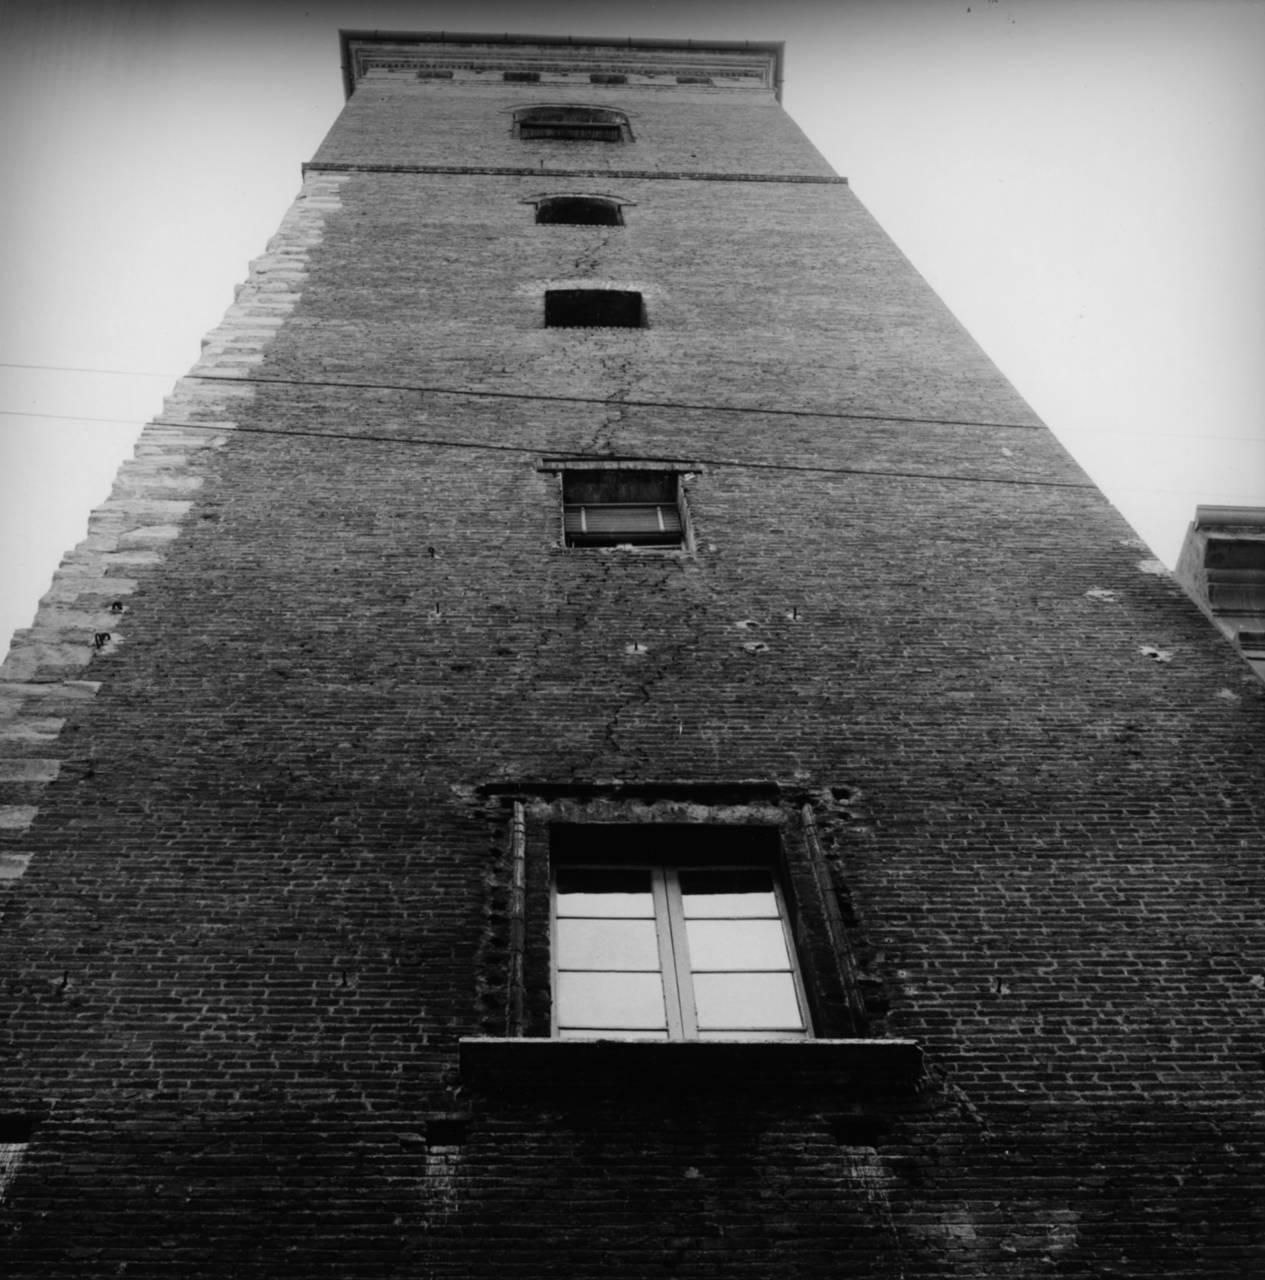 torre del bordello da via p. toschi fototeca biblioteca panizzi, fondo ivano burani - reggio emilia 1972